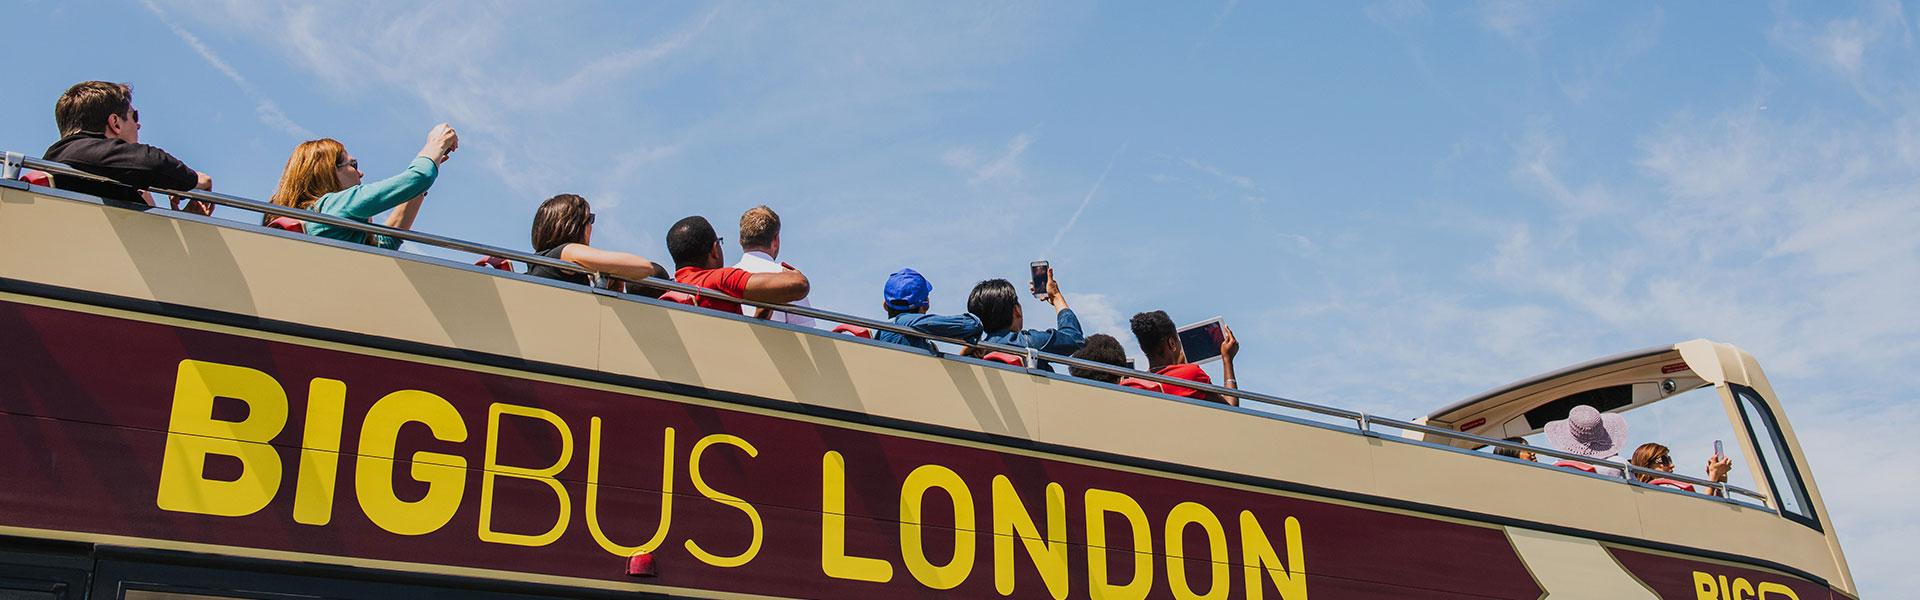 Passengers on London bus tour